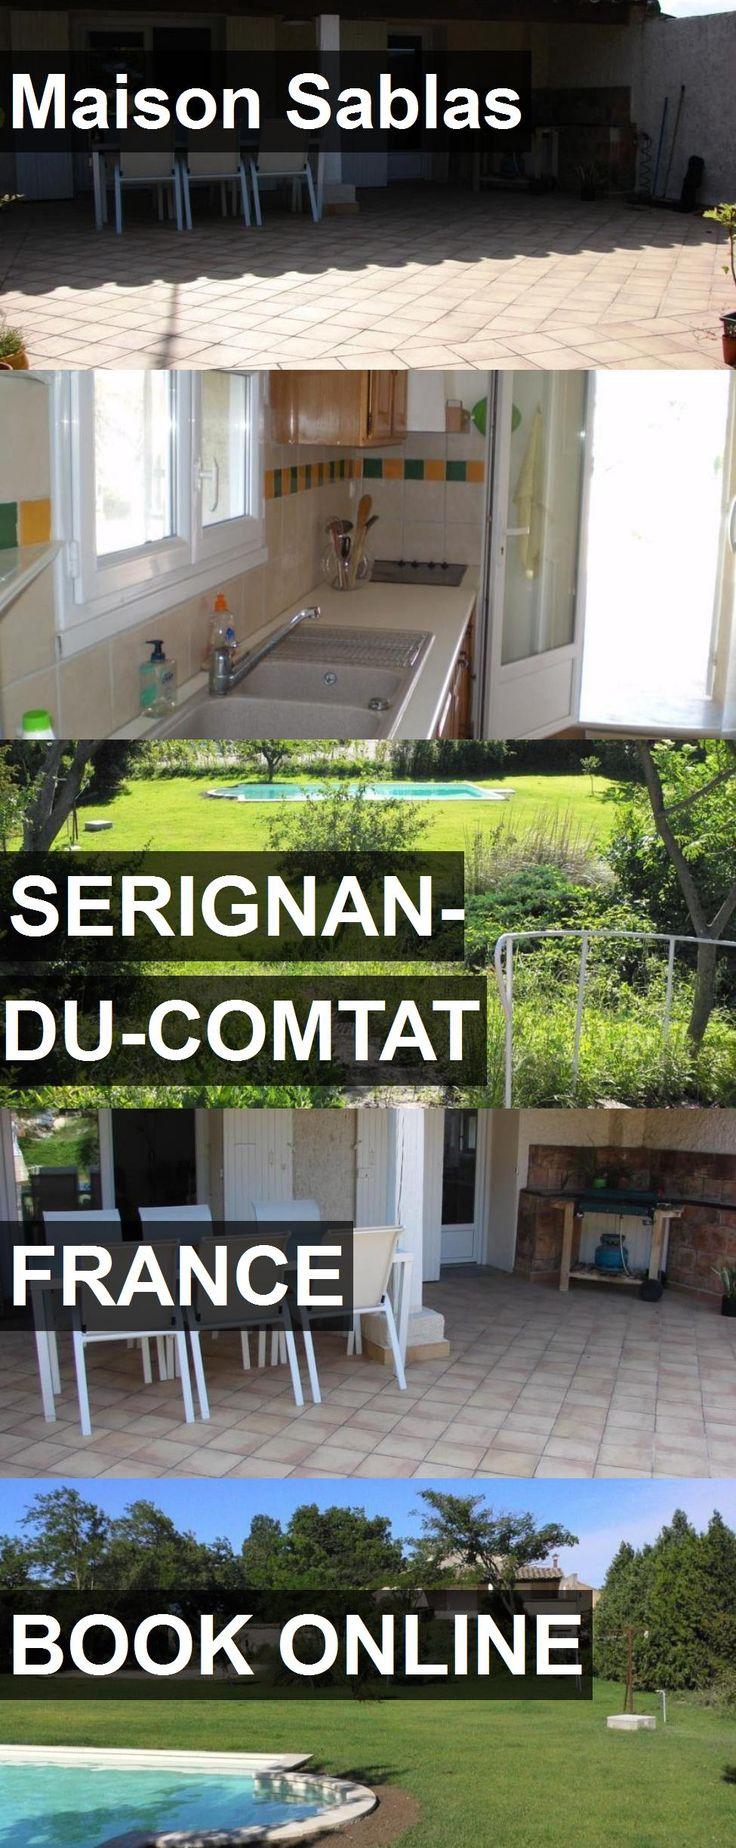 Hotel Maison Sablas in Serignan-du-Comtat, France. For more information, photos, reviews and best prices please follow the link. #France #Serignan-du-Comtat #travel #vacation #hotel